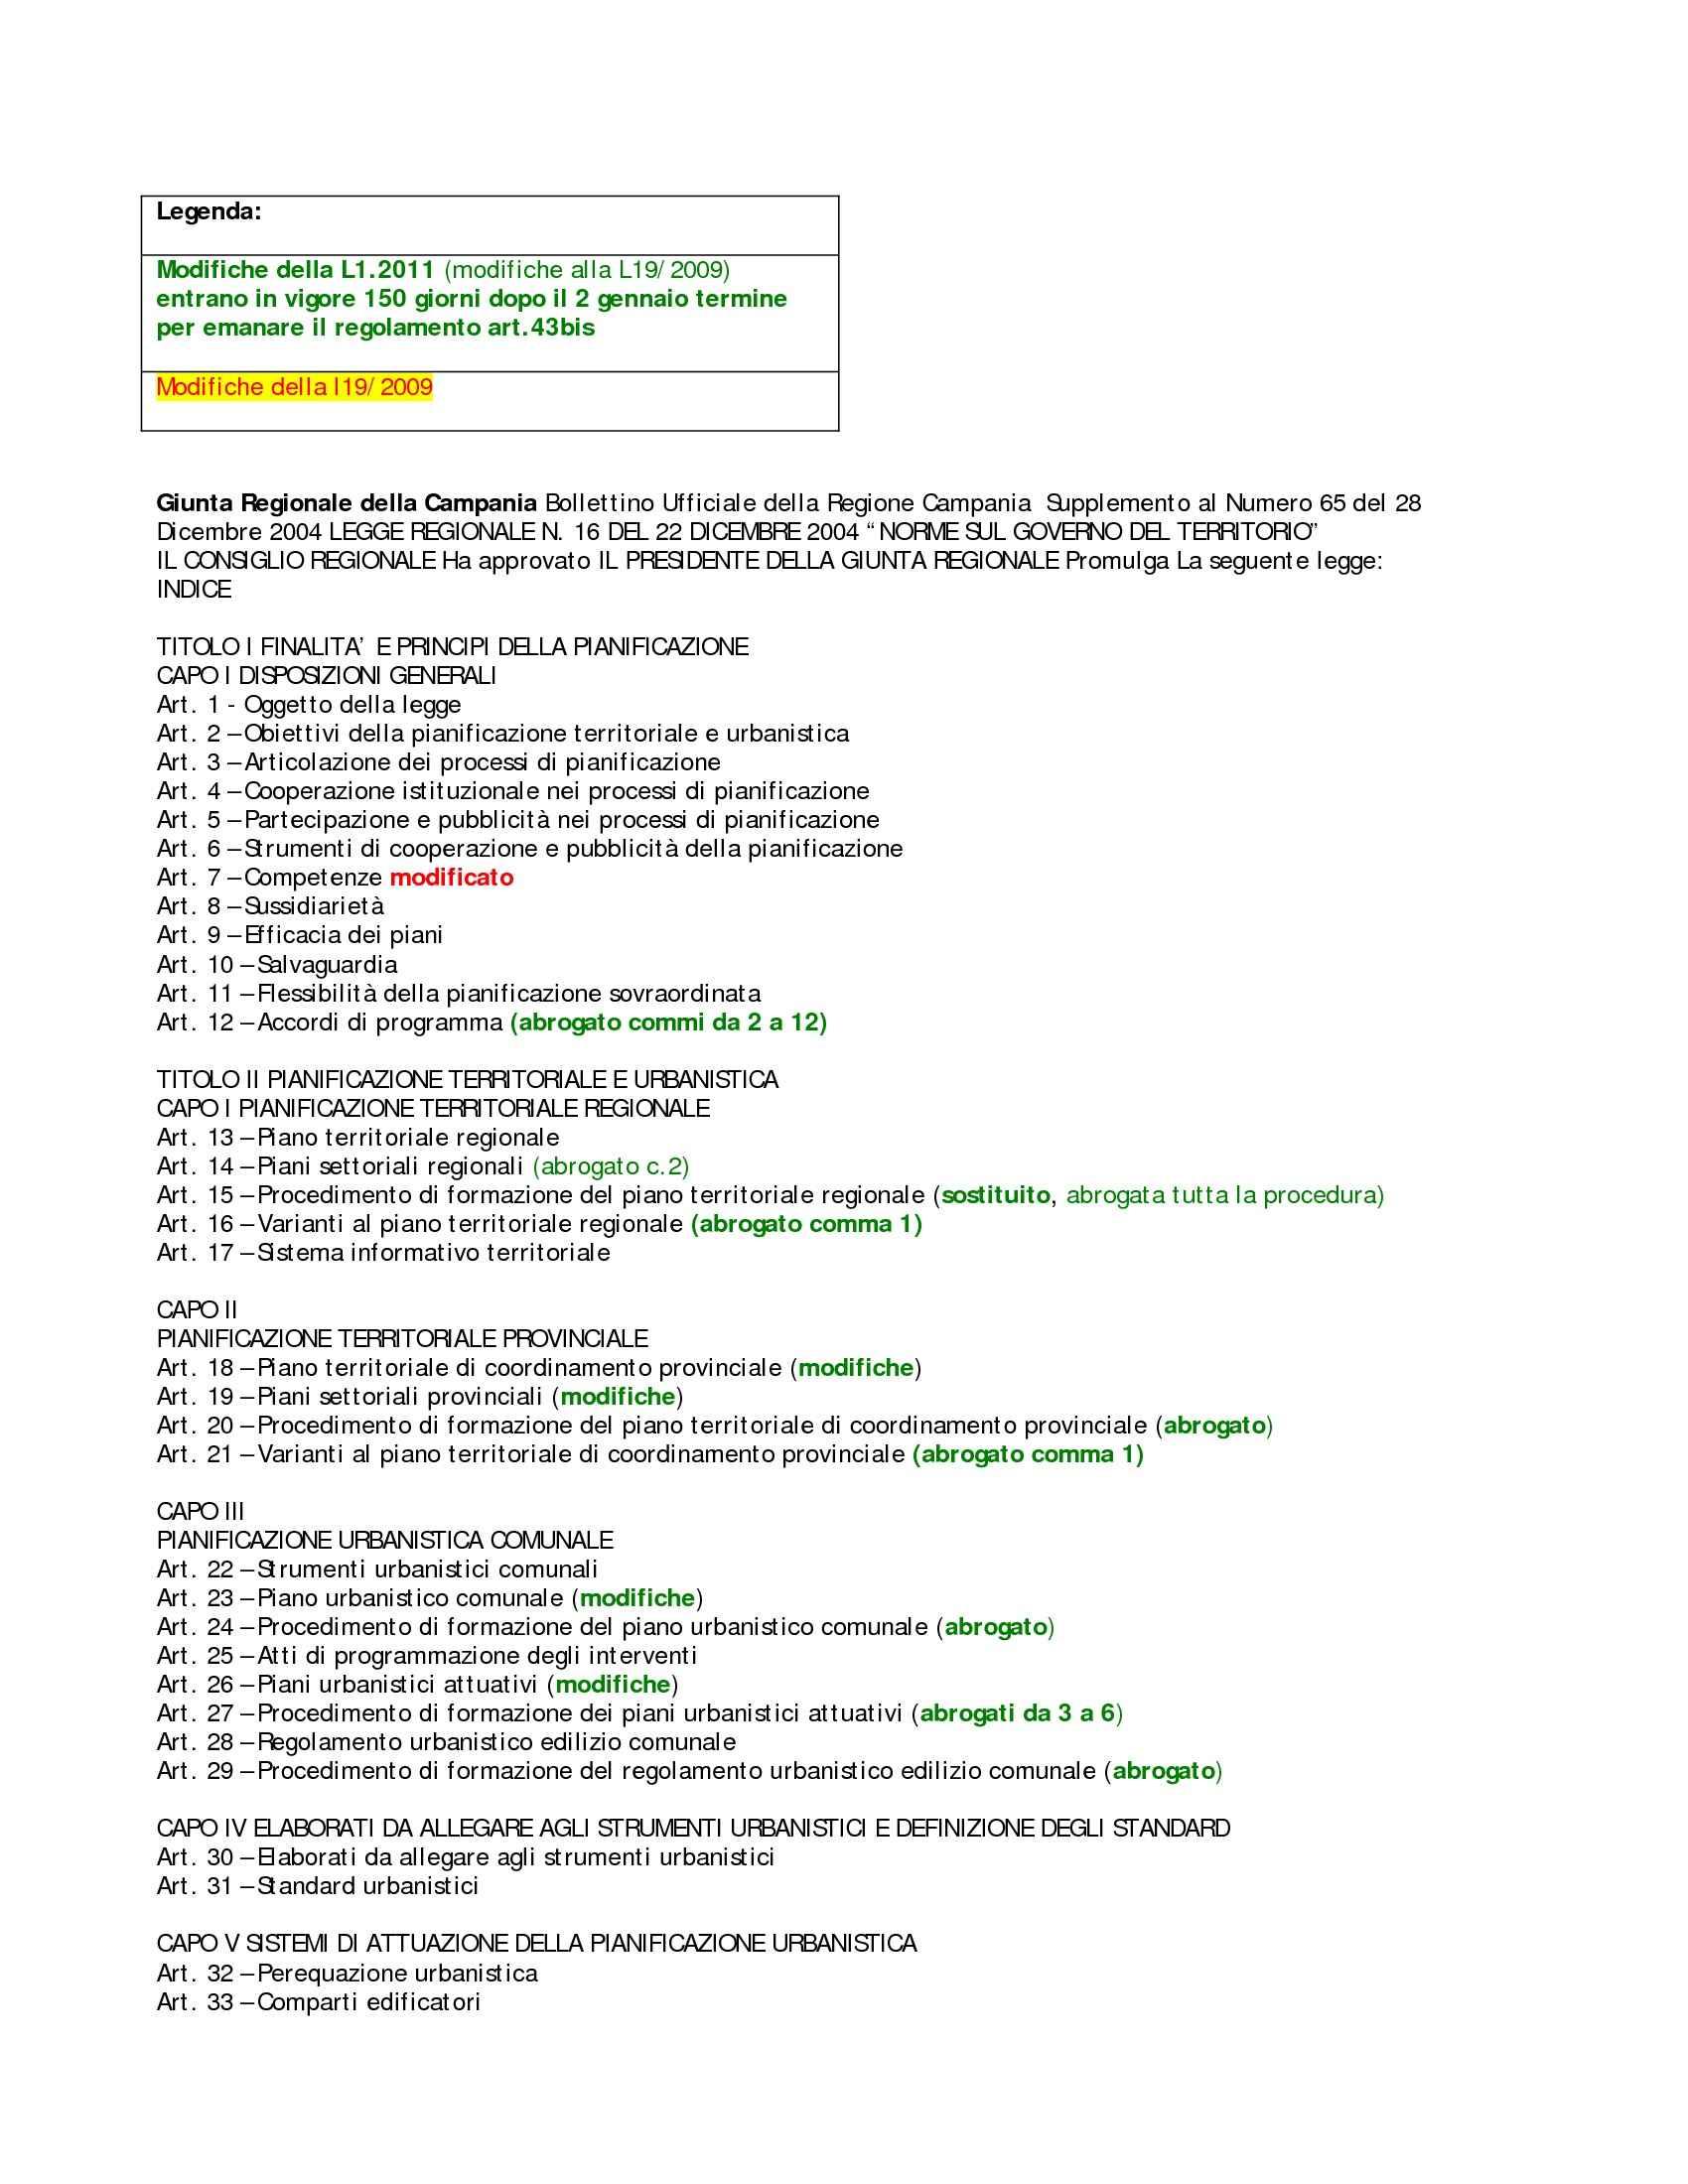 Legge pianificazione territoriale regione Campania 2